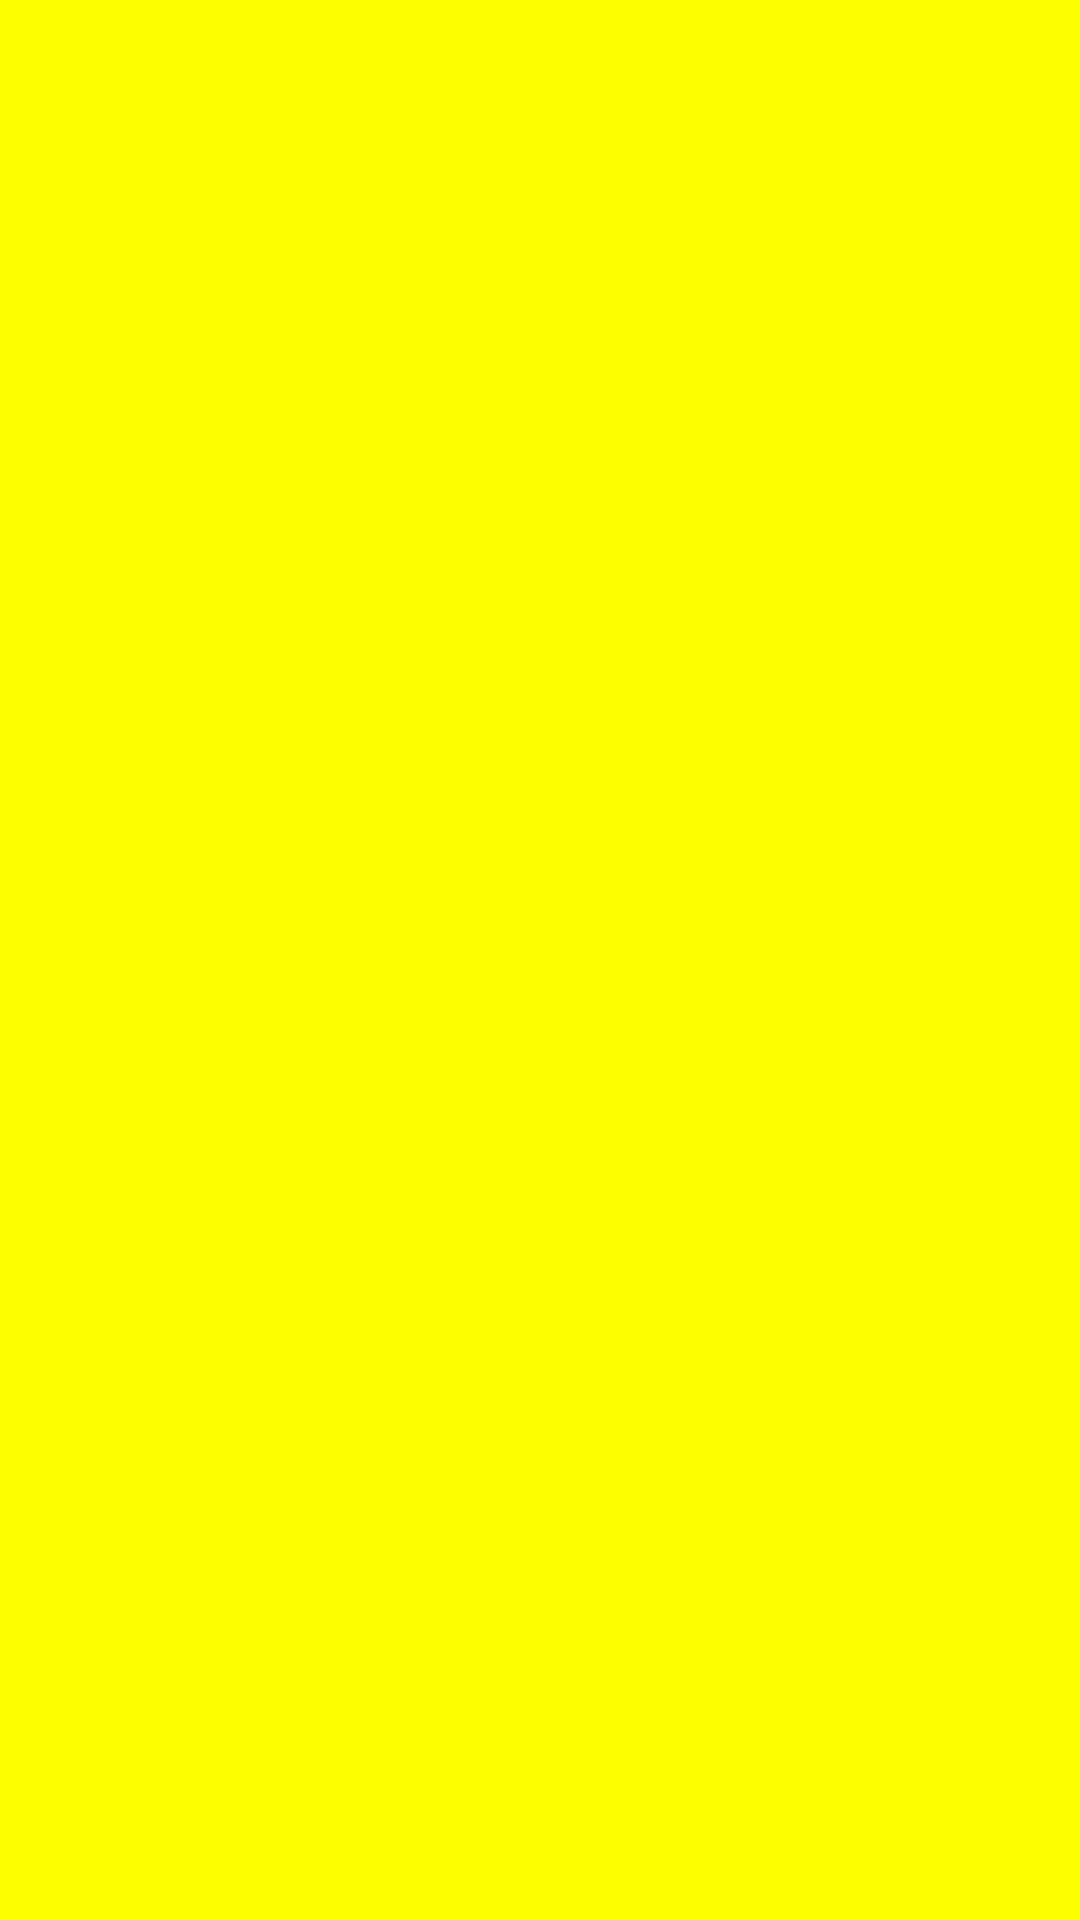 1080x1920 Lemon Glacier Solid Color Background